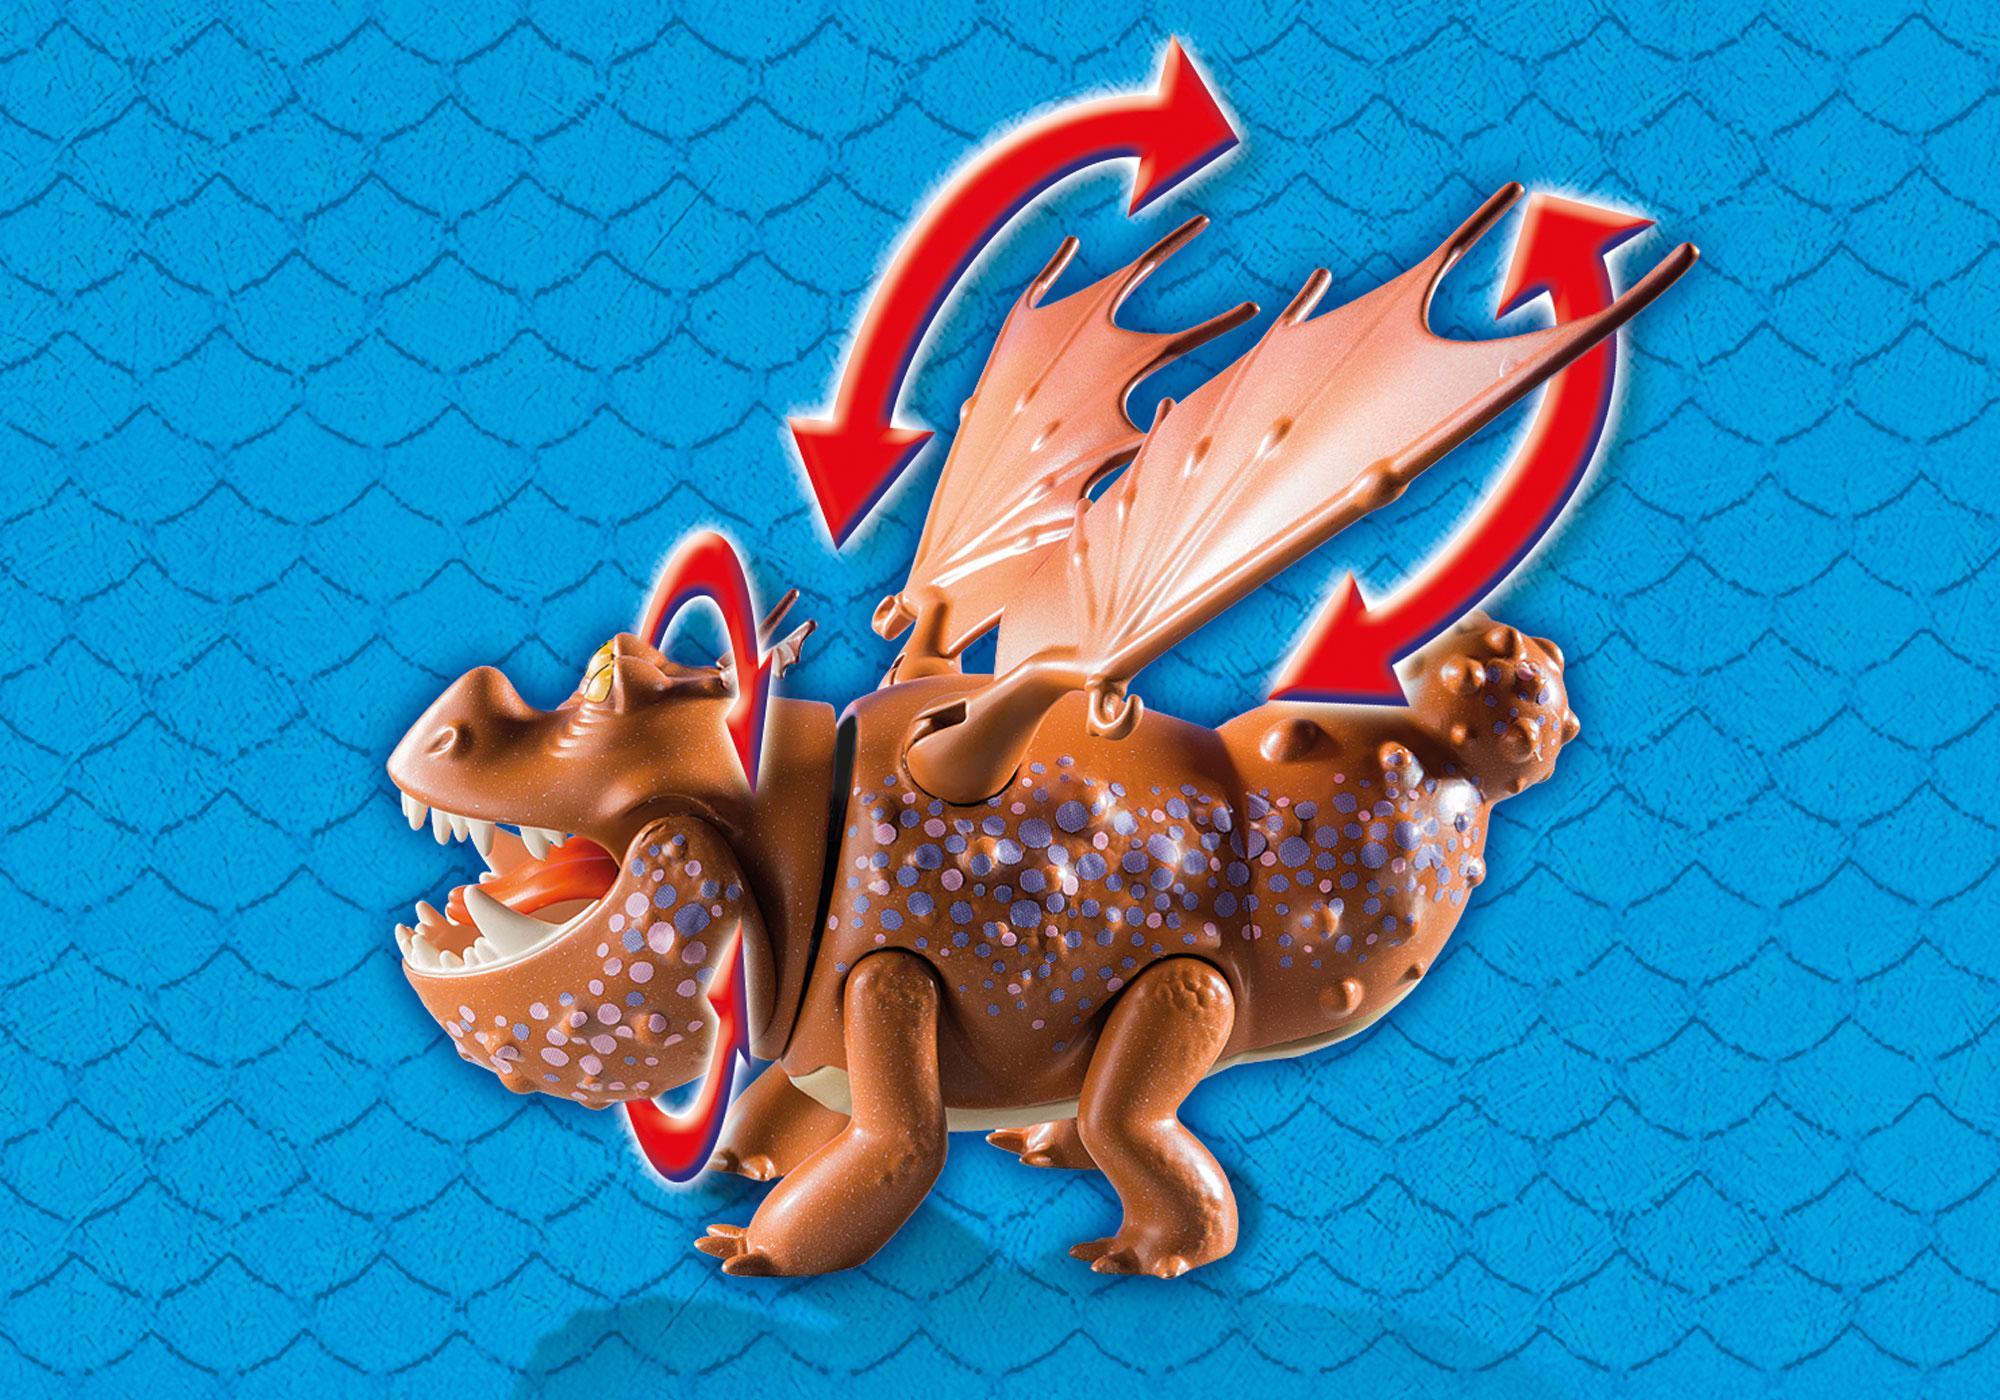 http://media.playmobil.com/i/playmobil/9460_product_extra1/Fischbein und Fleischklops